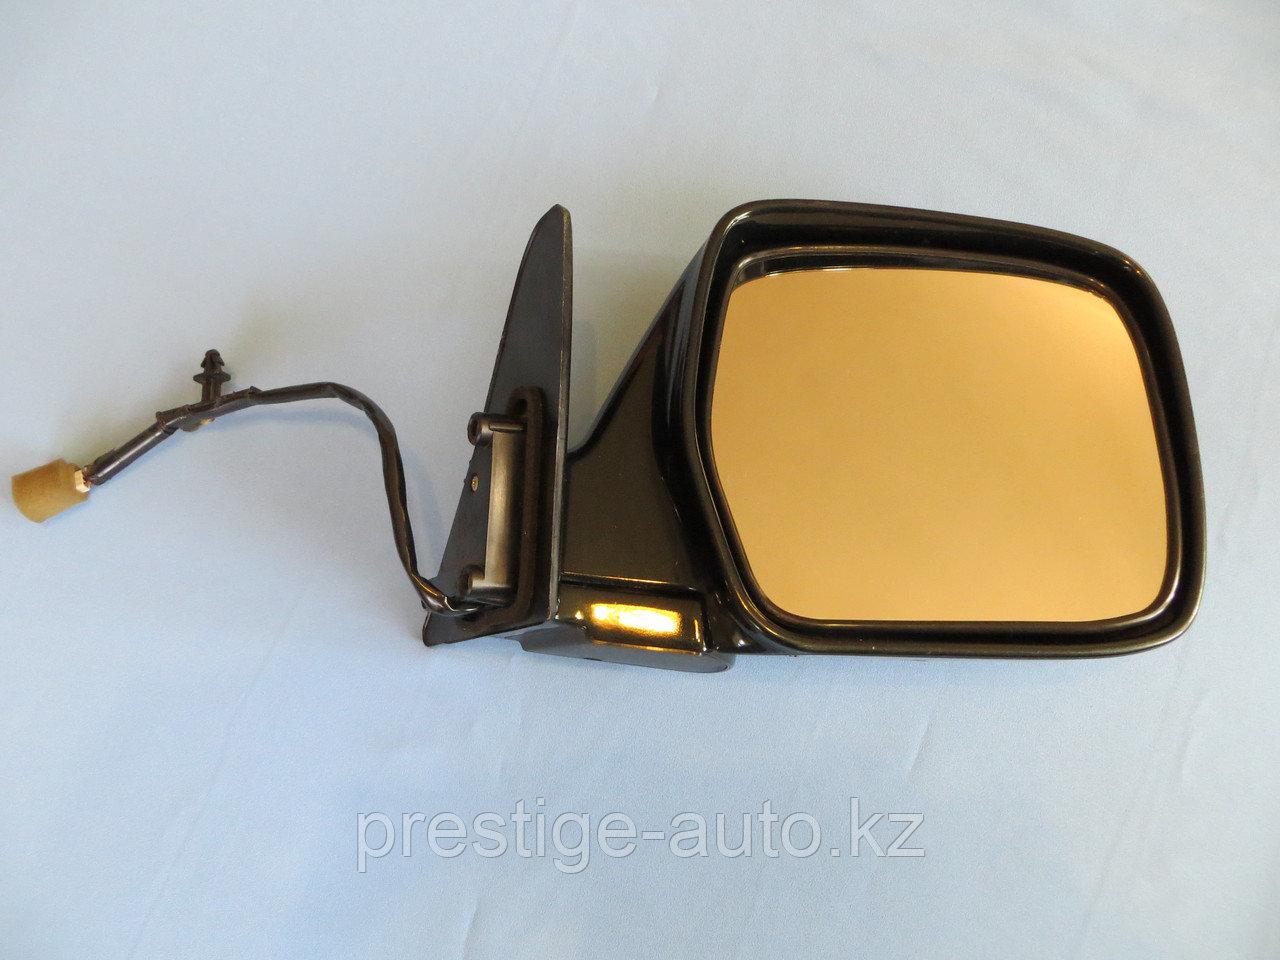 Правое зеркало на Toyota land cruiser 80